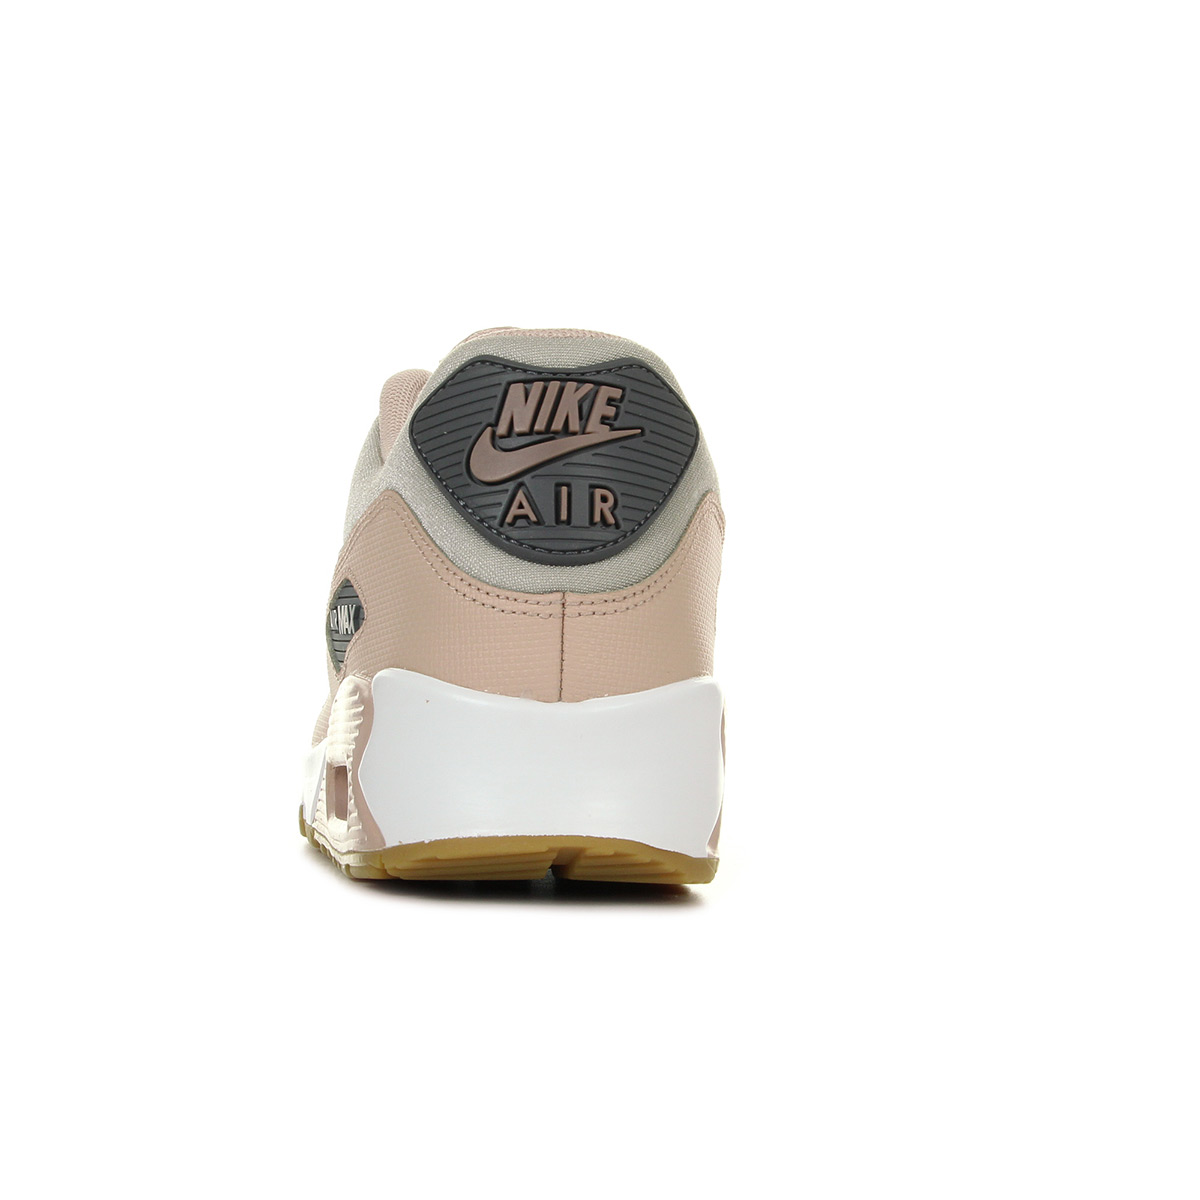 Chaussures Baskets Nike femme Wmns Air Max 90